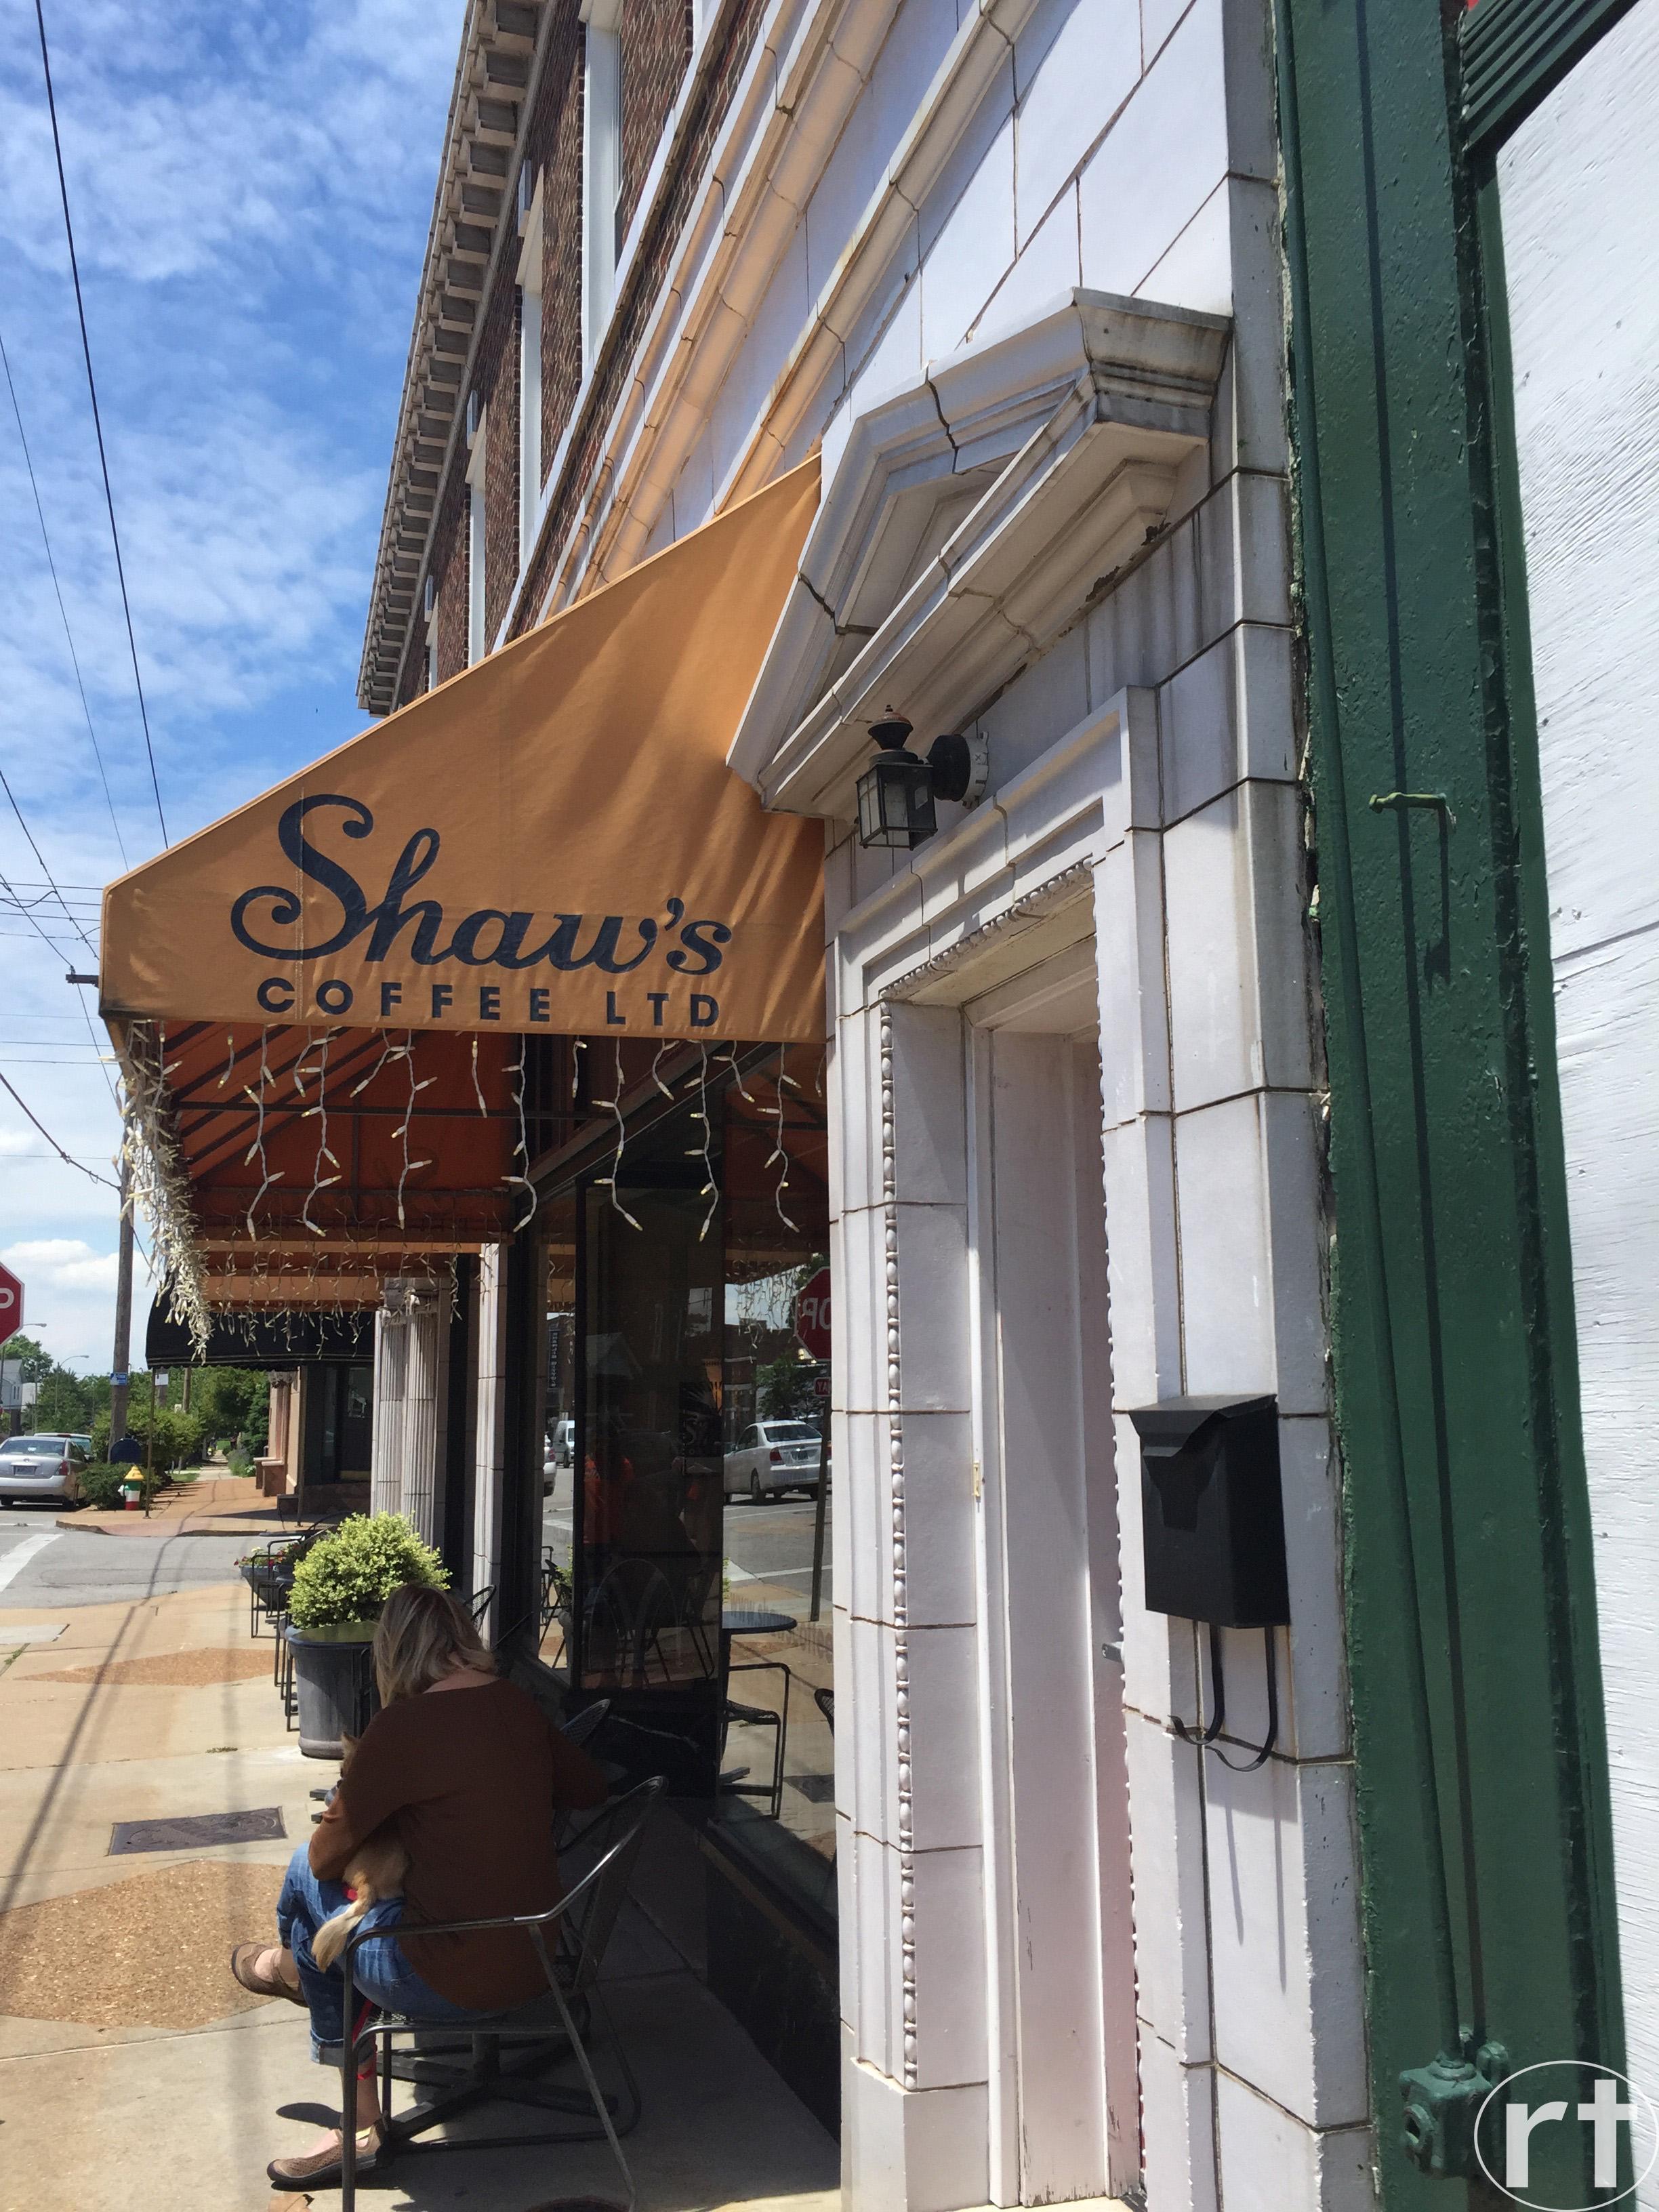 Shaw's Coffee St. Louis Street View